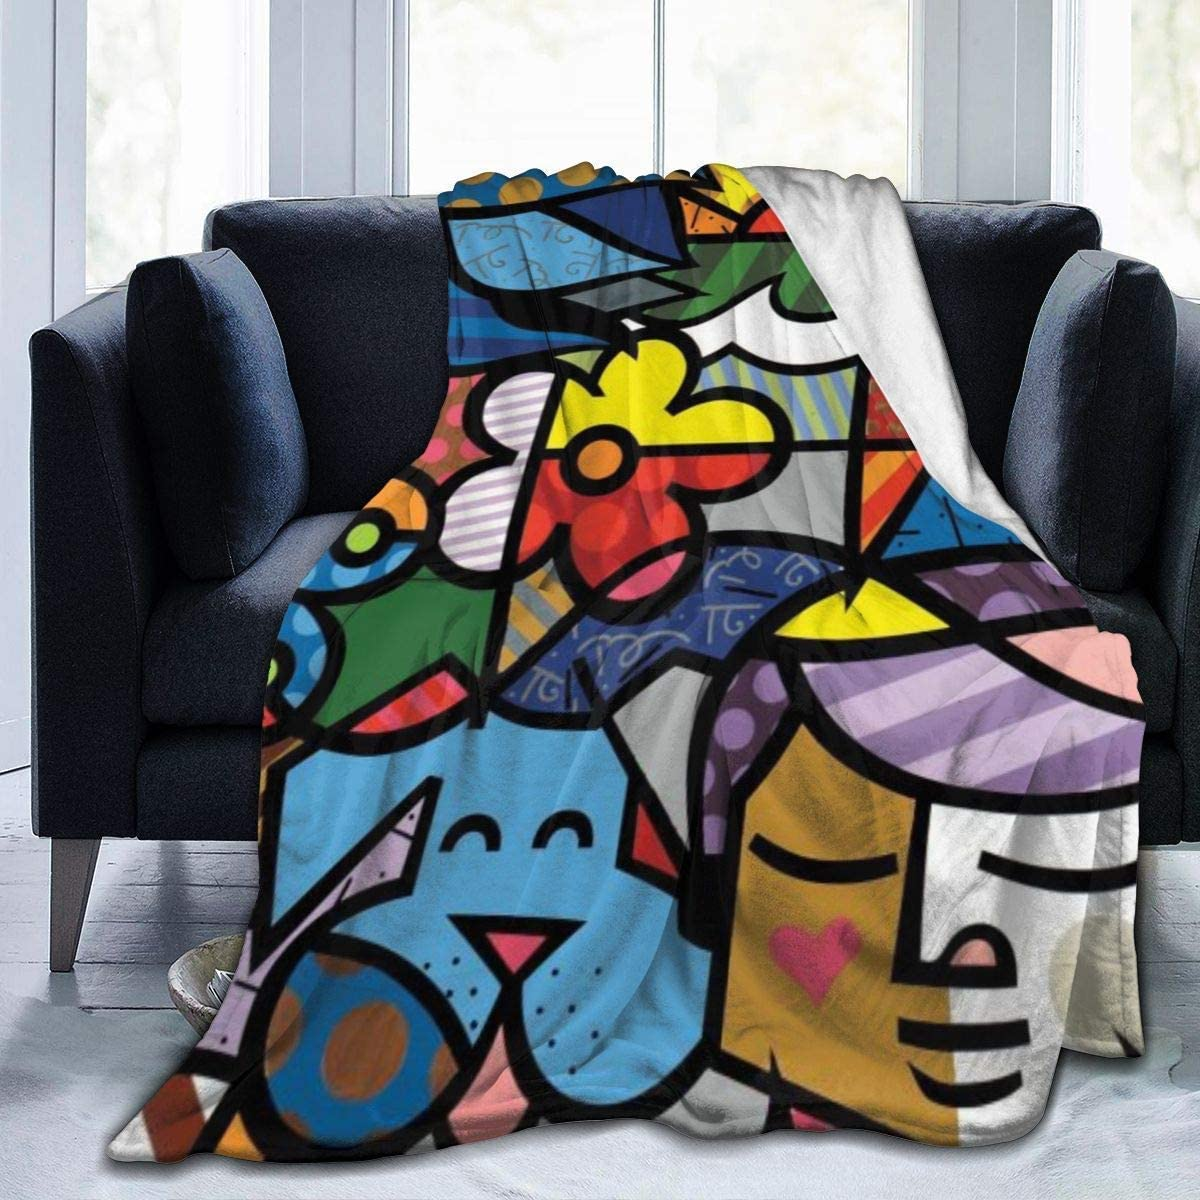 Hoswee Coperta Vellutata in Pile Romero-Britto Gambar Grafiti Nama Bayu Super Soft Cozy Micro Plush Velvet Fleece Blanket Warm Fuzzy Bed Throw Blanket Luxurious